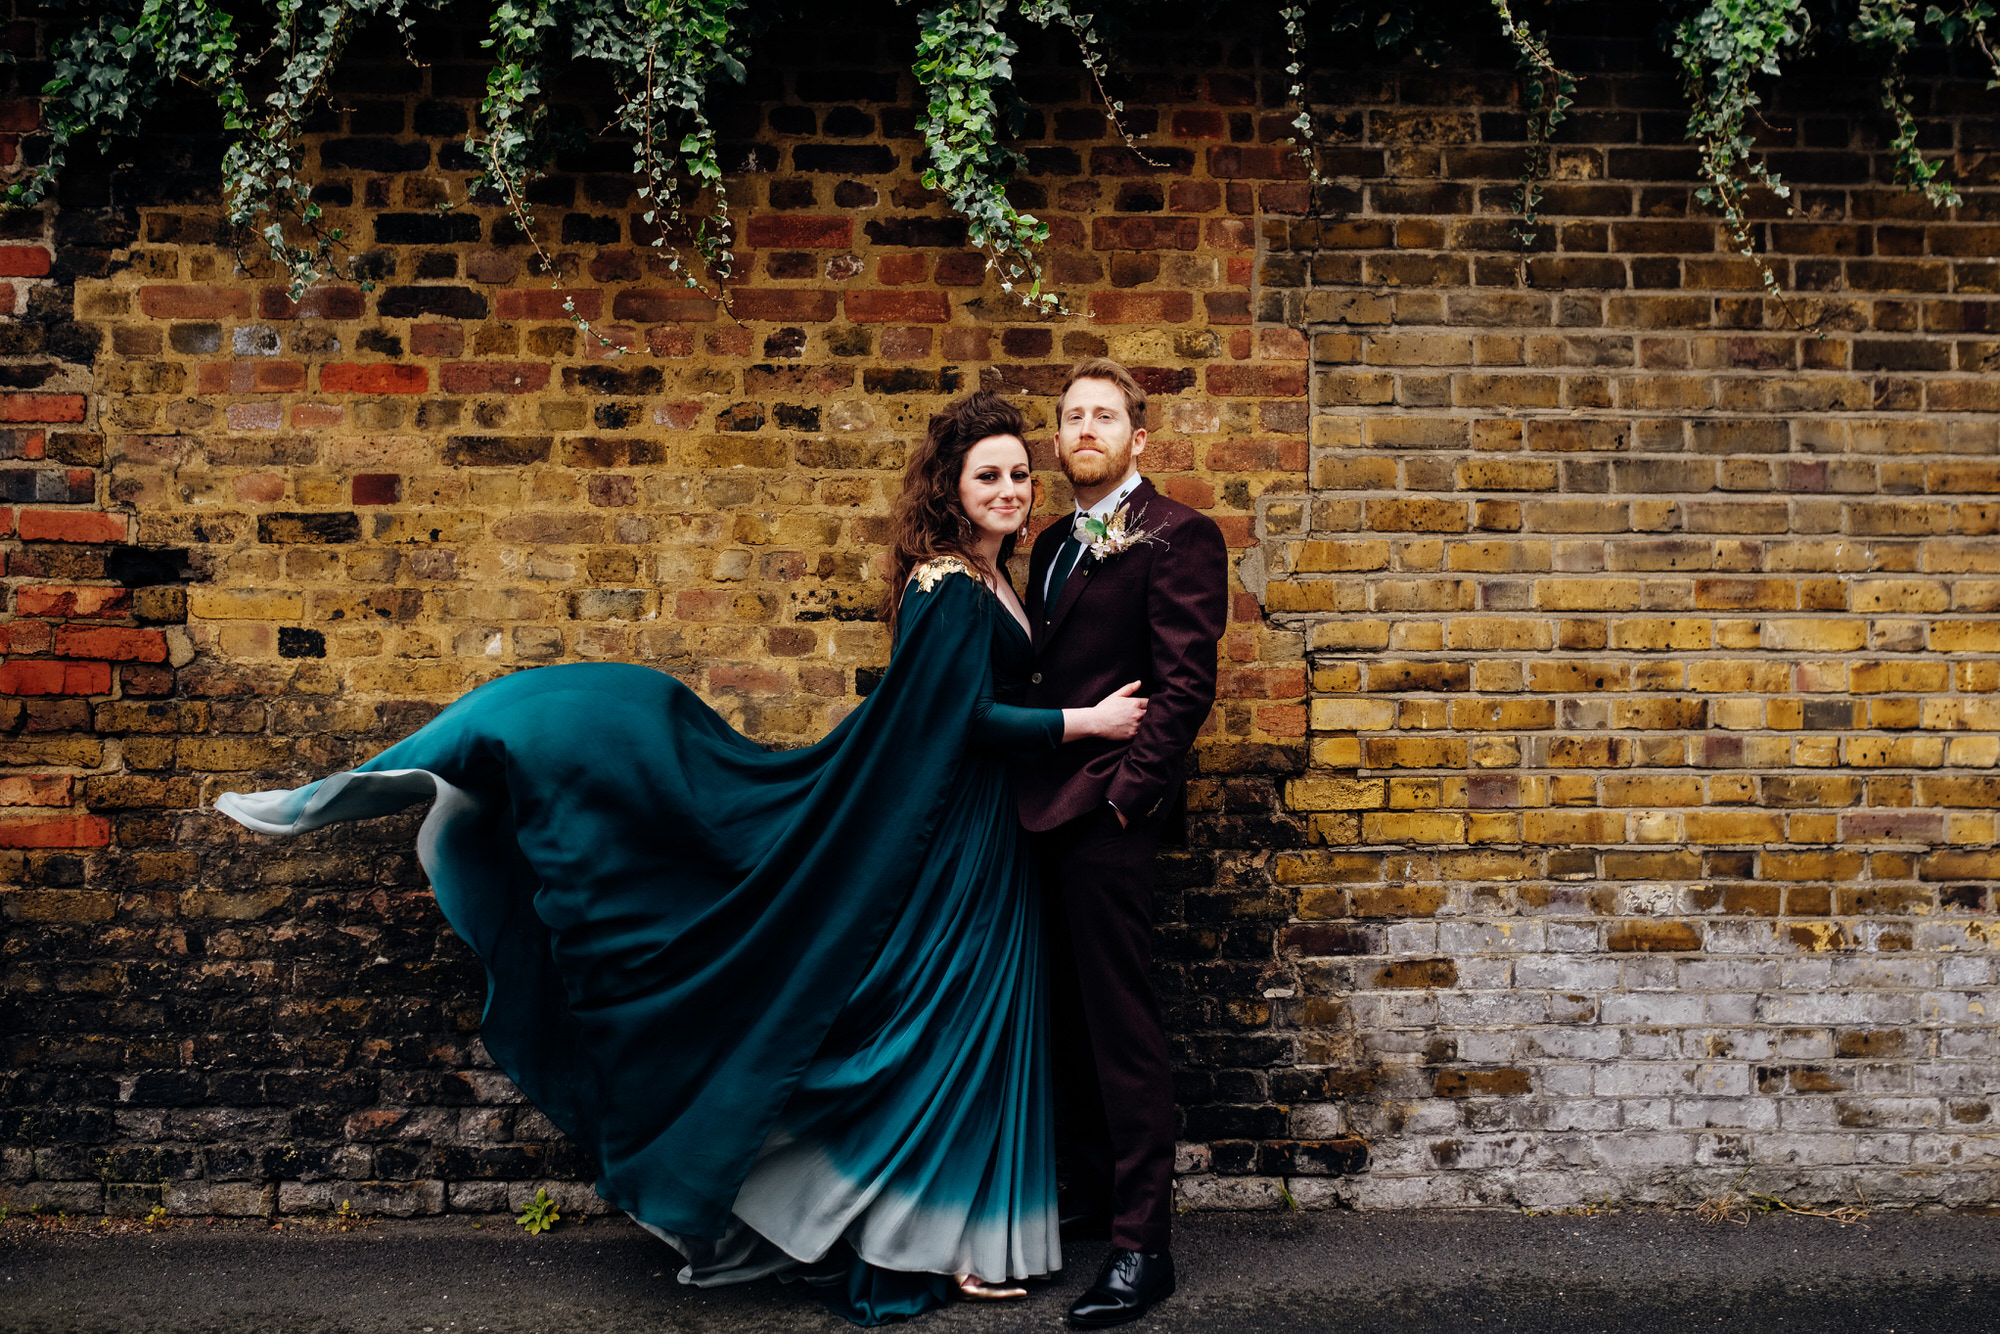 39180-jewish-wedding-photographer-london